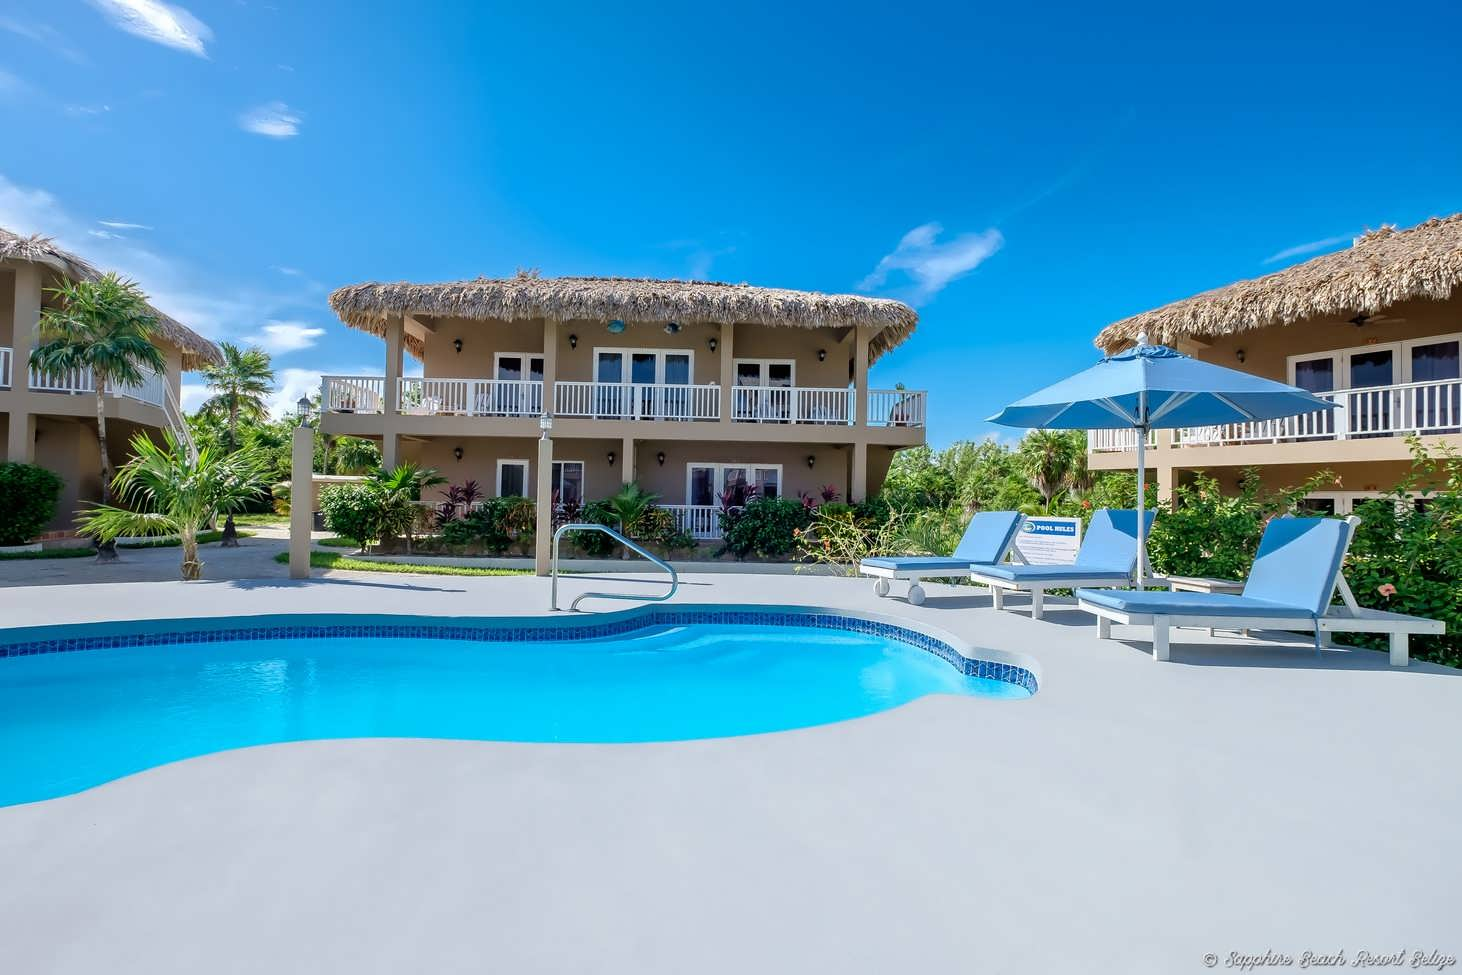 Sapphire Beach Resort Pools 24.jpg